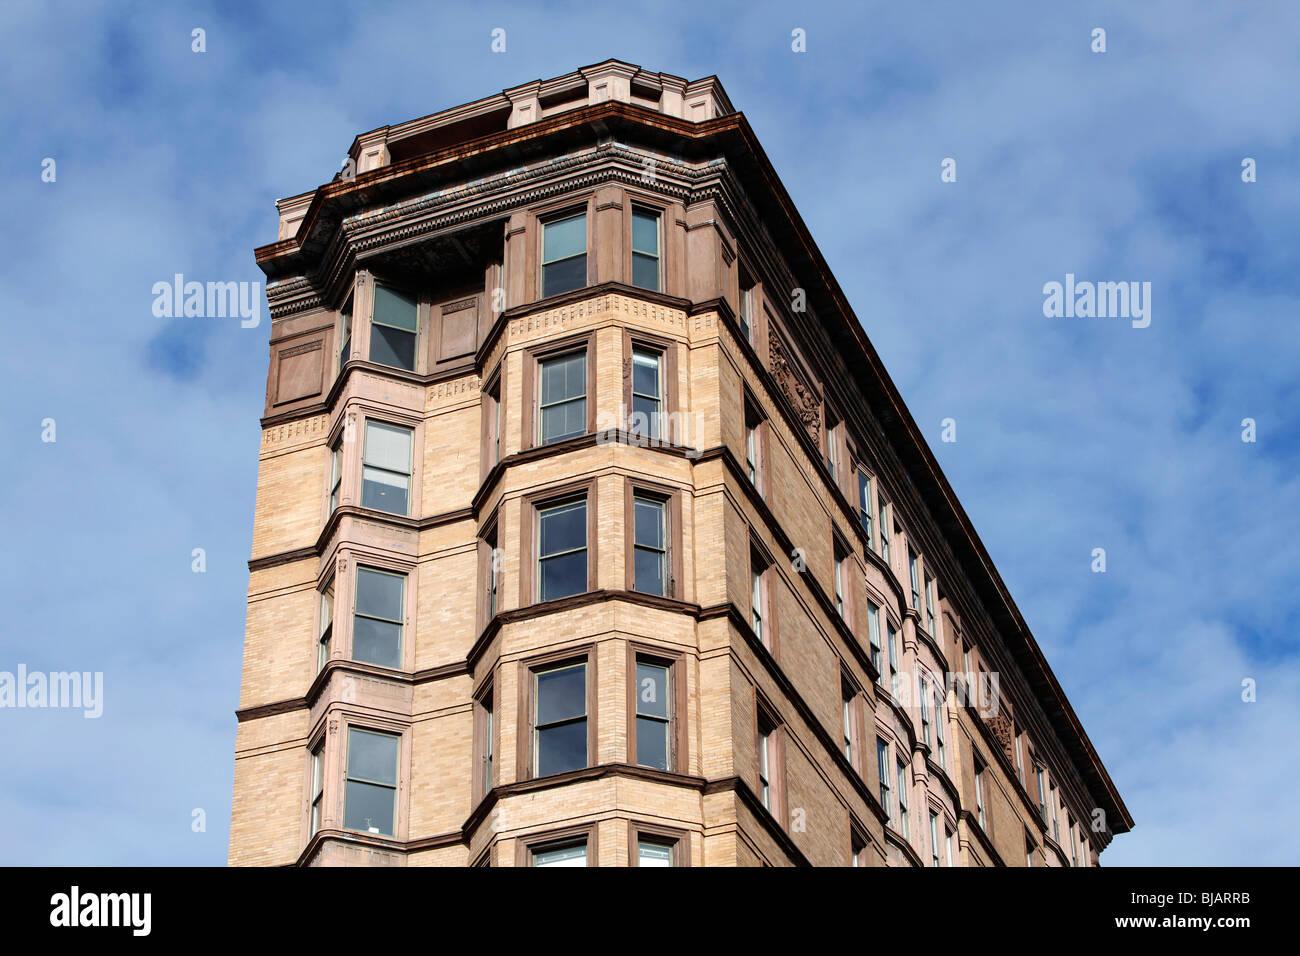 Boston, Massachusetts, Back Bay, multi story apartment building with bay windows - Stock Image